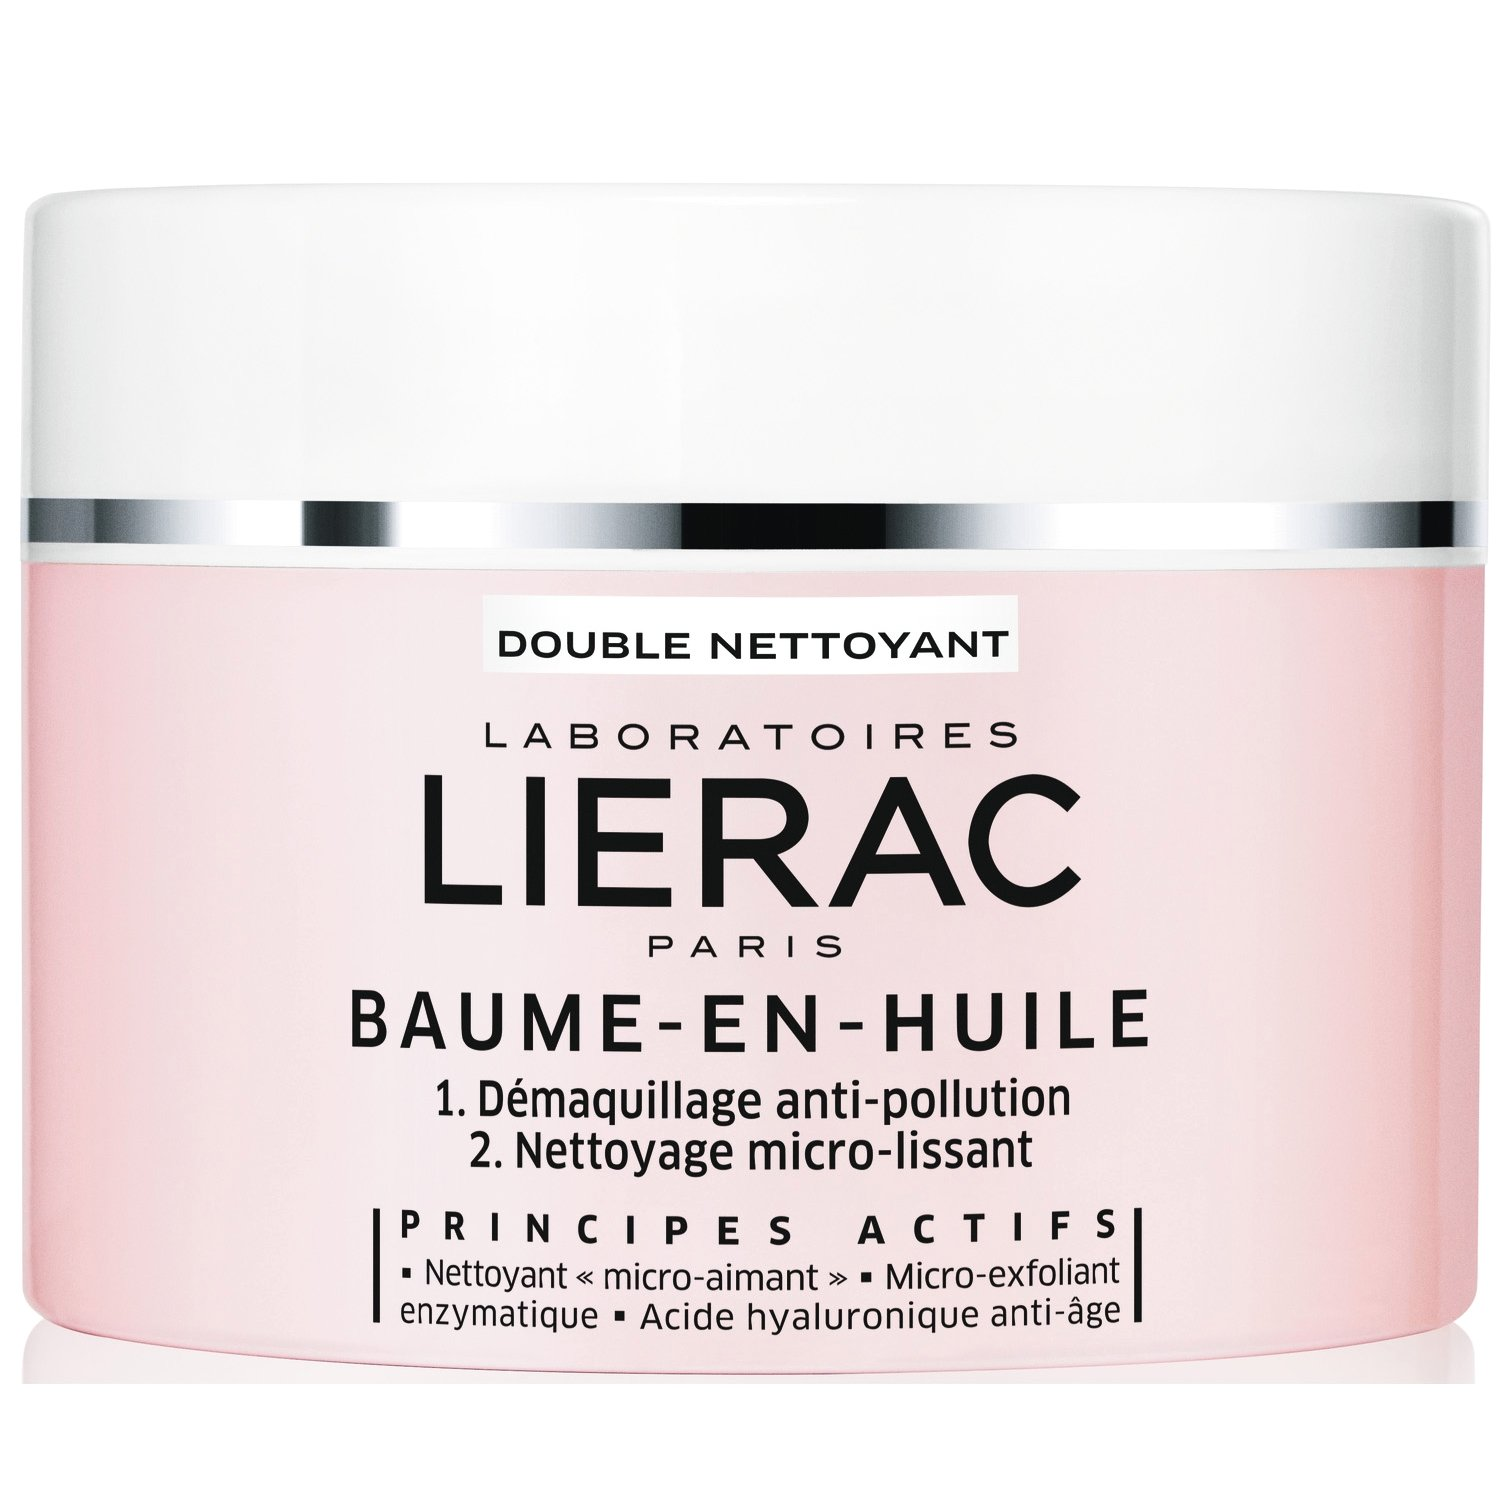 Lierac Demaquillant Baume – en – Huile Balm σε Έλαιο Διπλού Καθαρισμού120ml